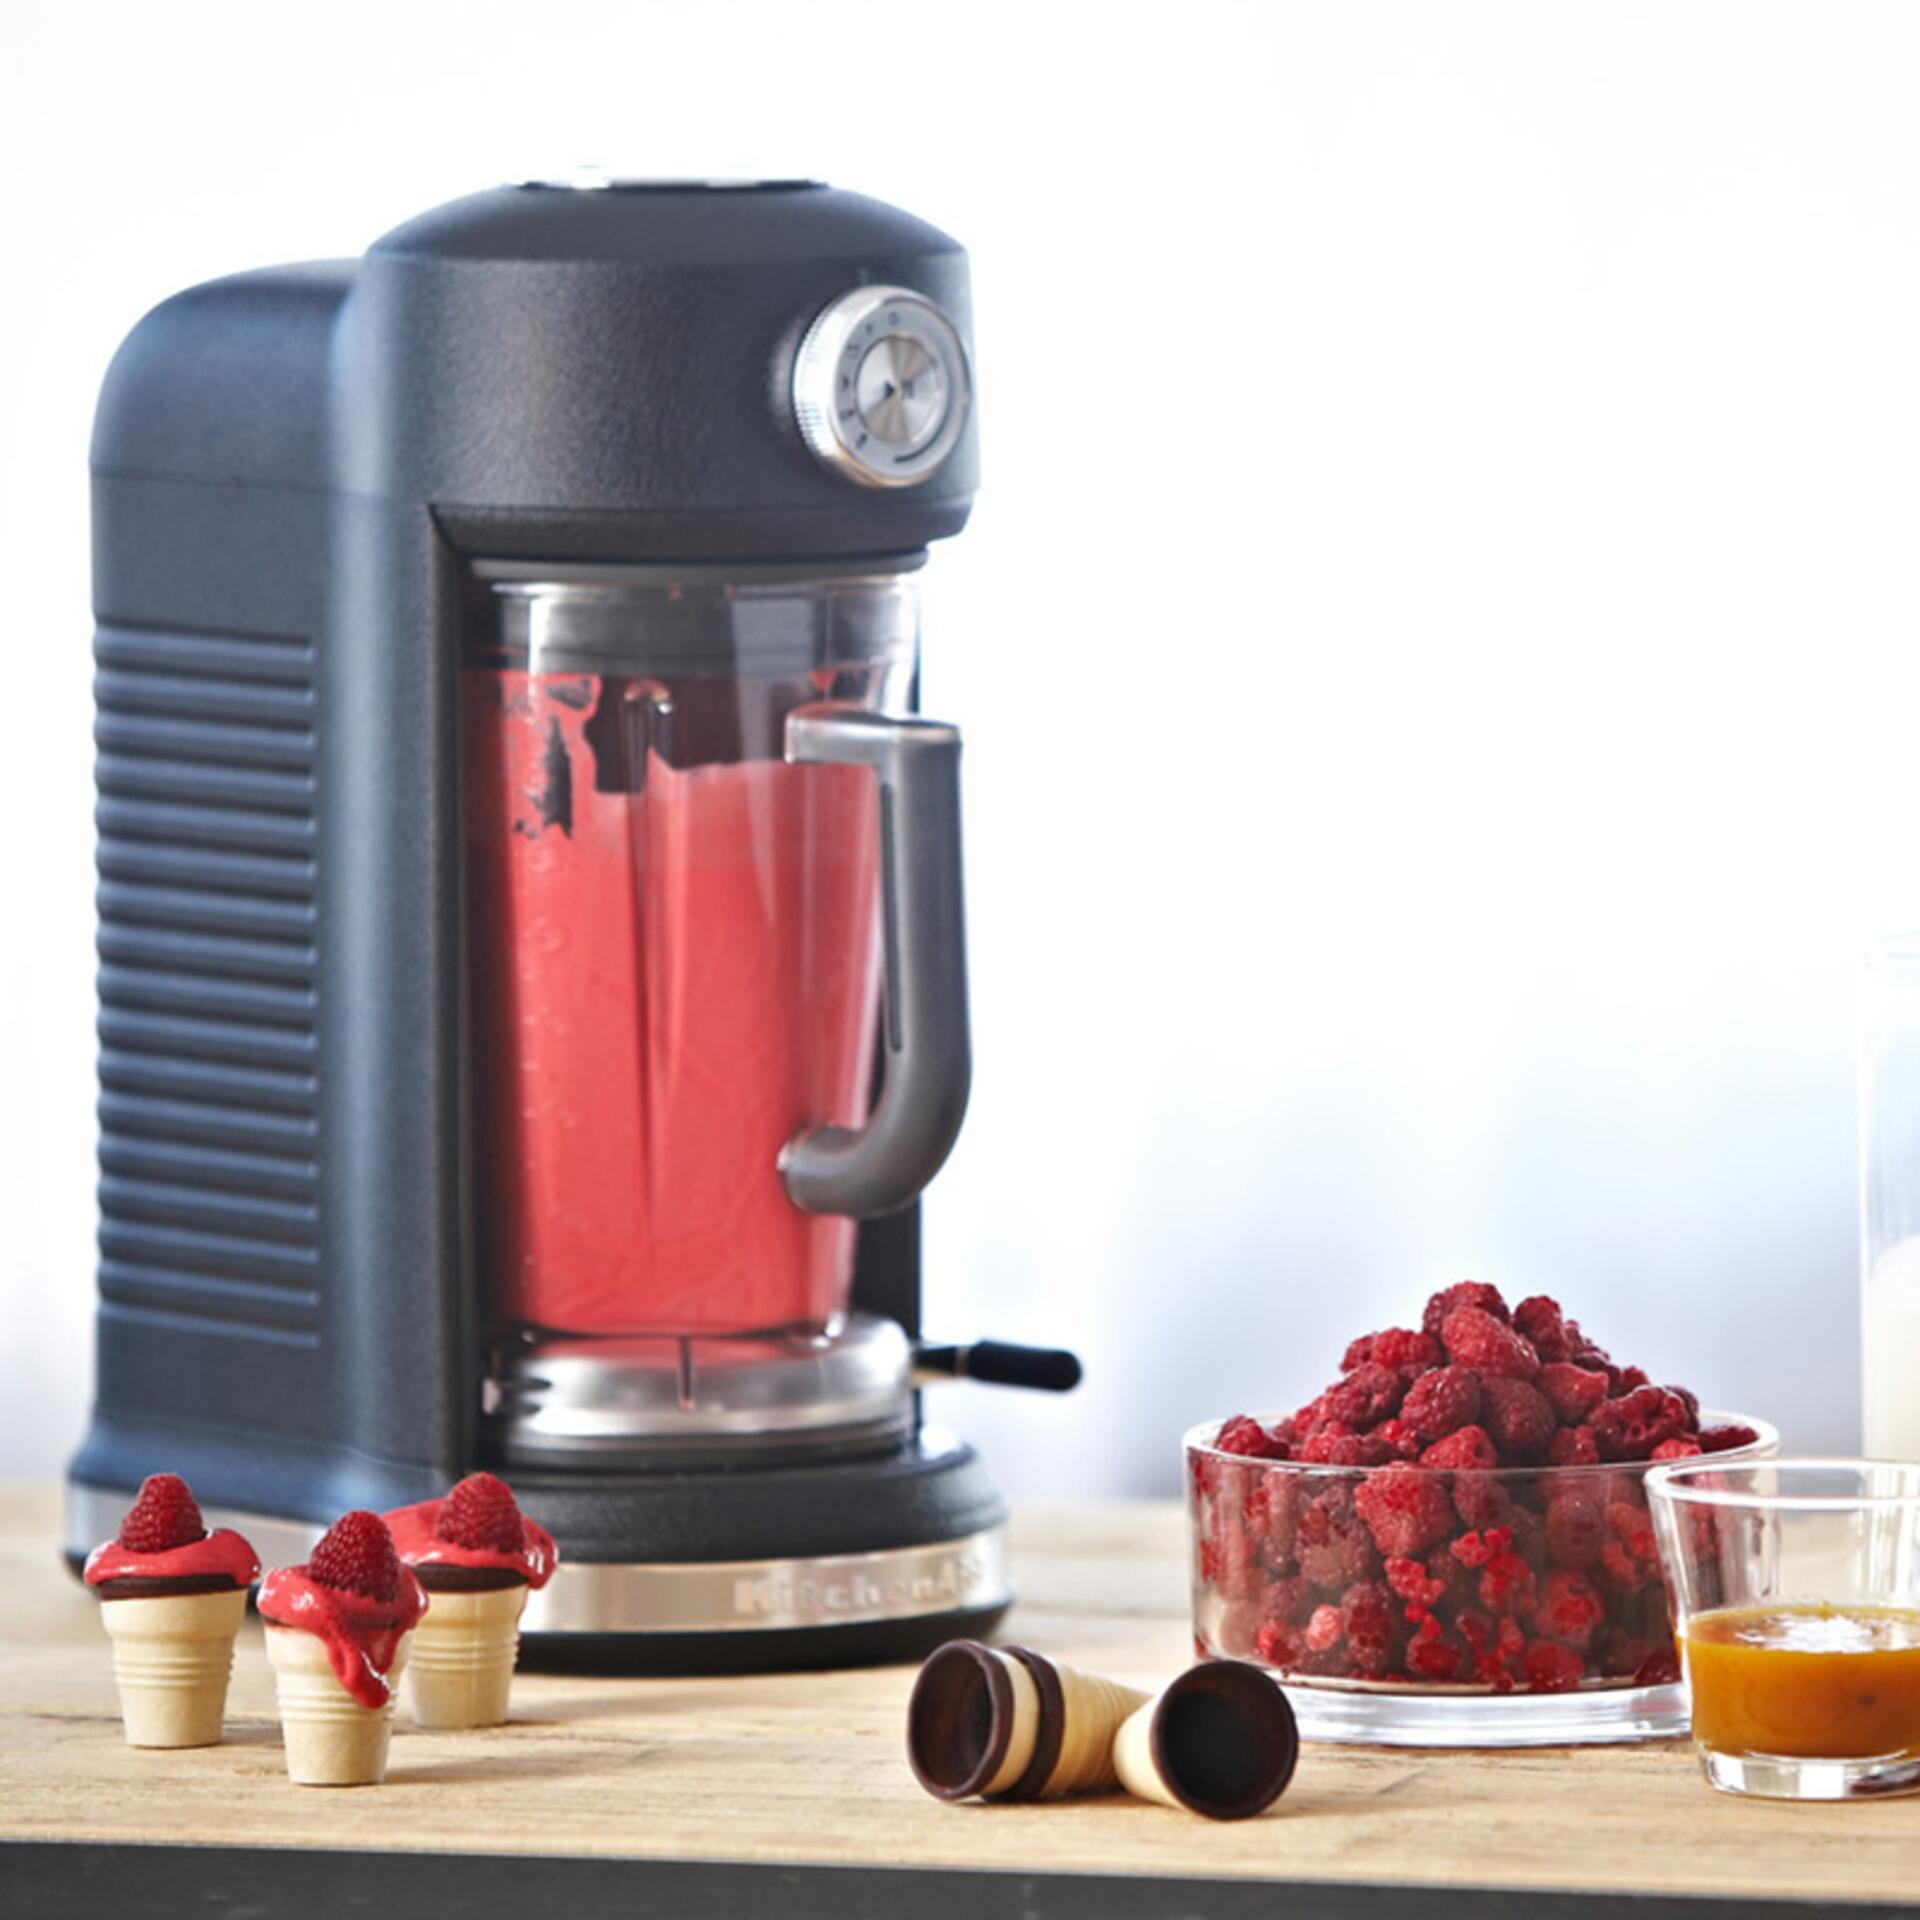 KitchenAid Artisan Mixer Magnetic Drive Blender 5KSB5080EOB Schwarz